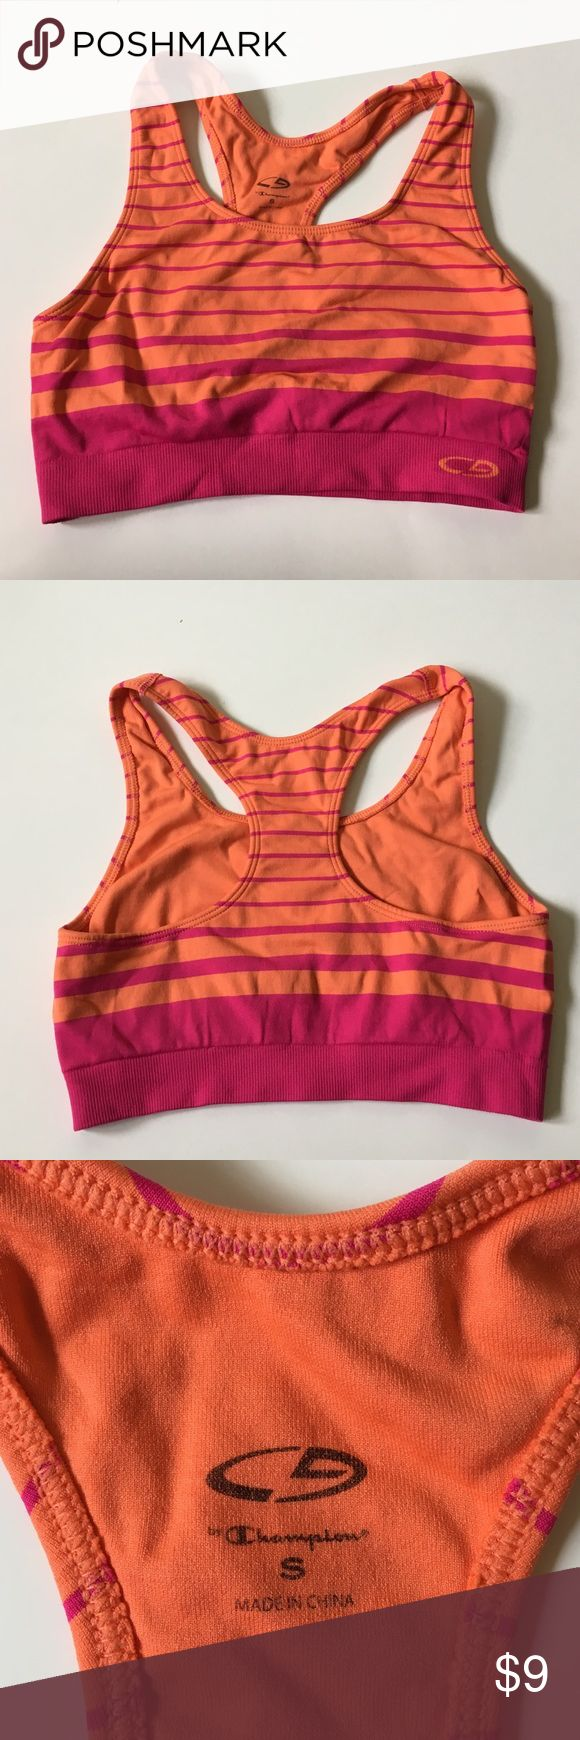 Champion Sports Bra Pink and orange champion sports bra. Size small. Excellent condition. Champion Intimates & Sleepwear Bras